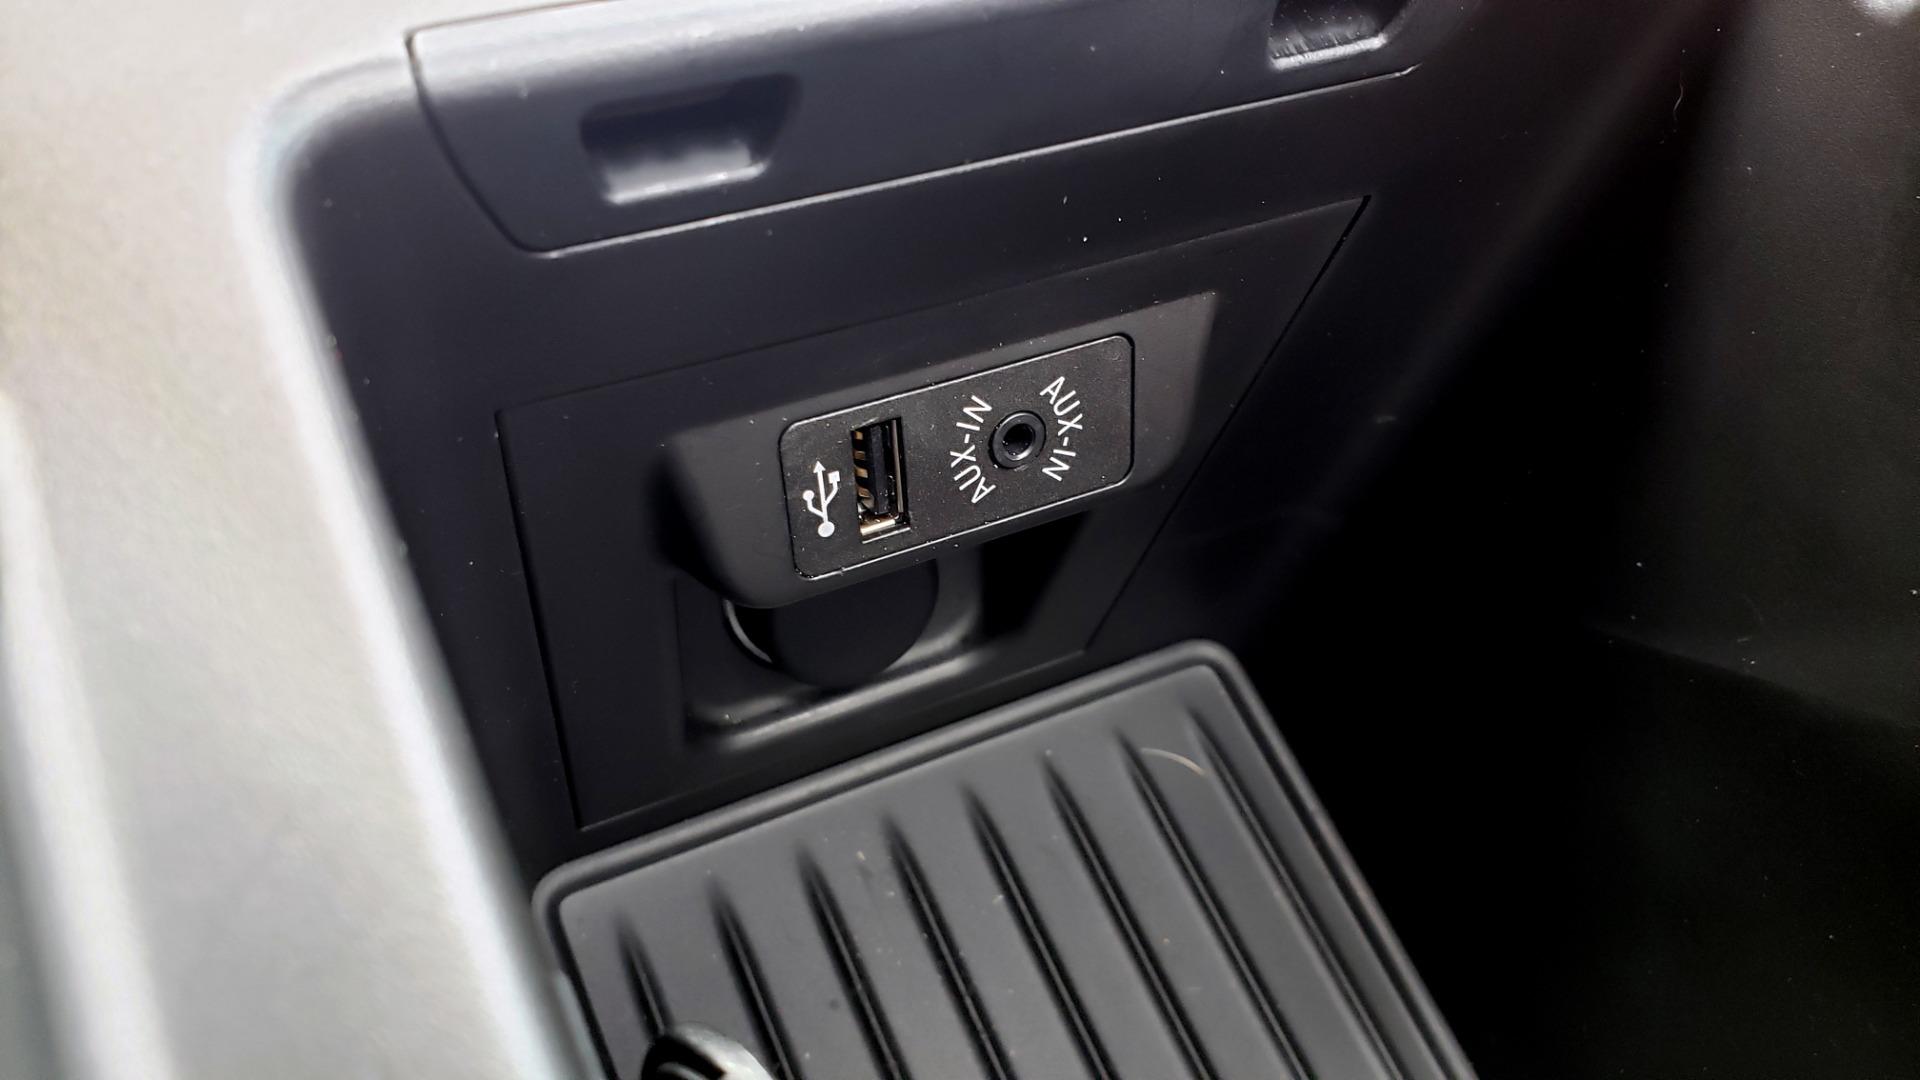 Used 2017 BMW X5 M EXECUTIVE PKG / NAV / DRVR ASST / BSM / HUD / HTD STS / WIFI for sale Sold at Formula Imports in Charlotte NC 28227 60